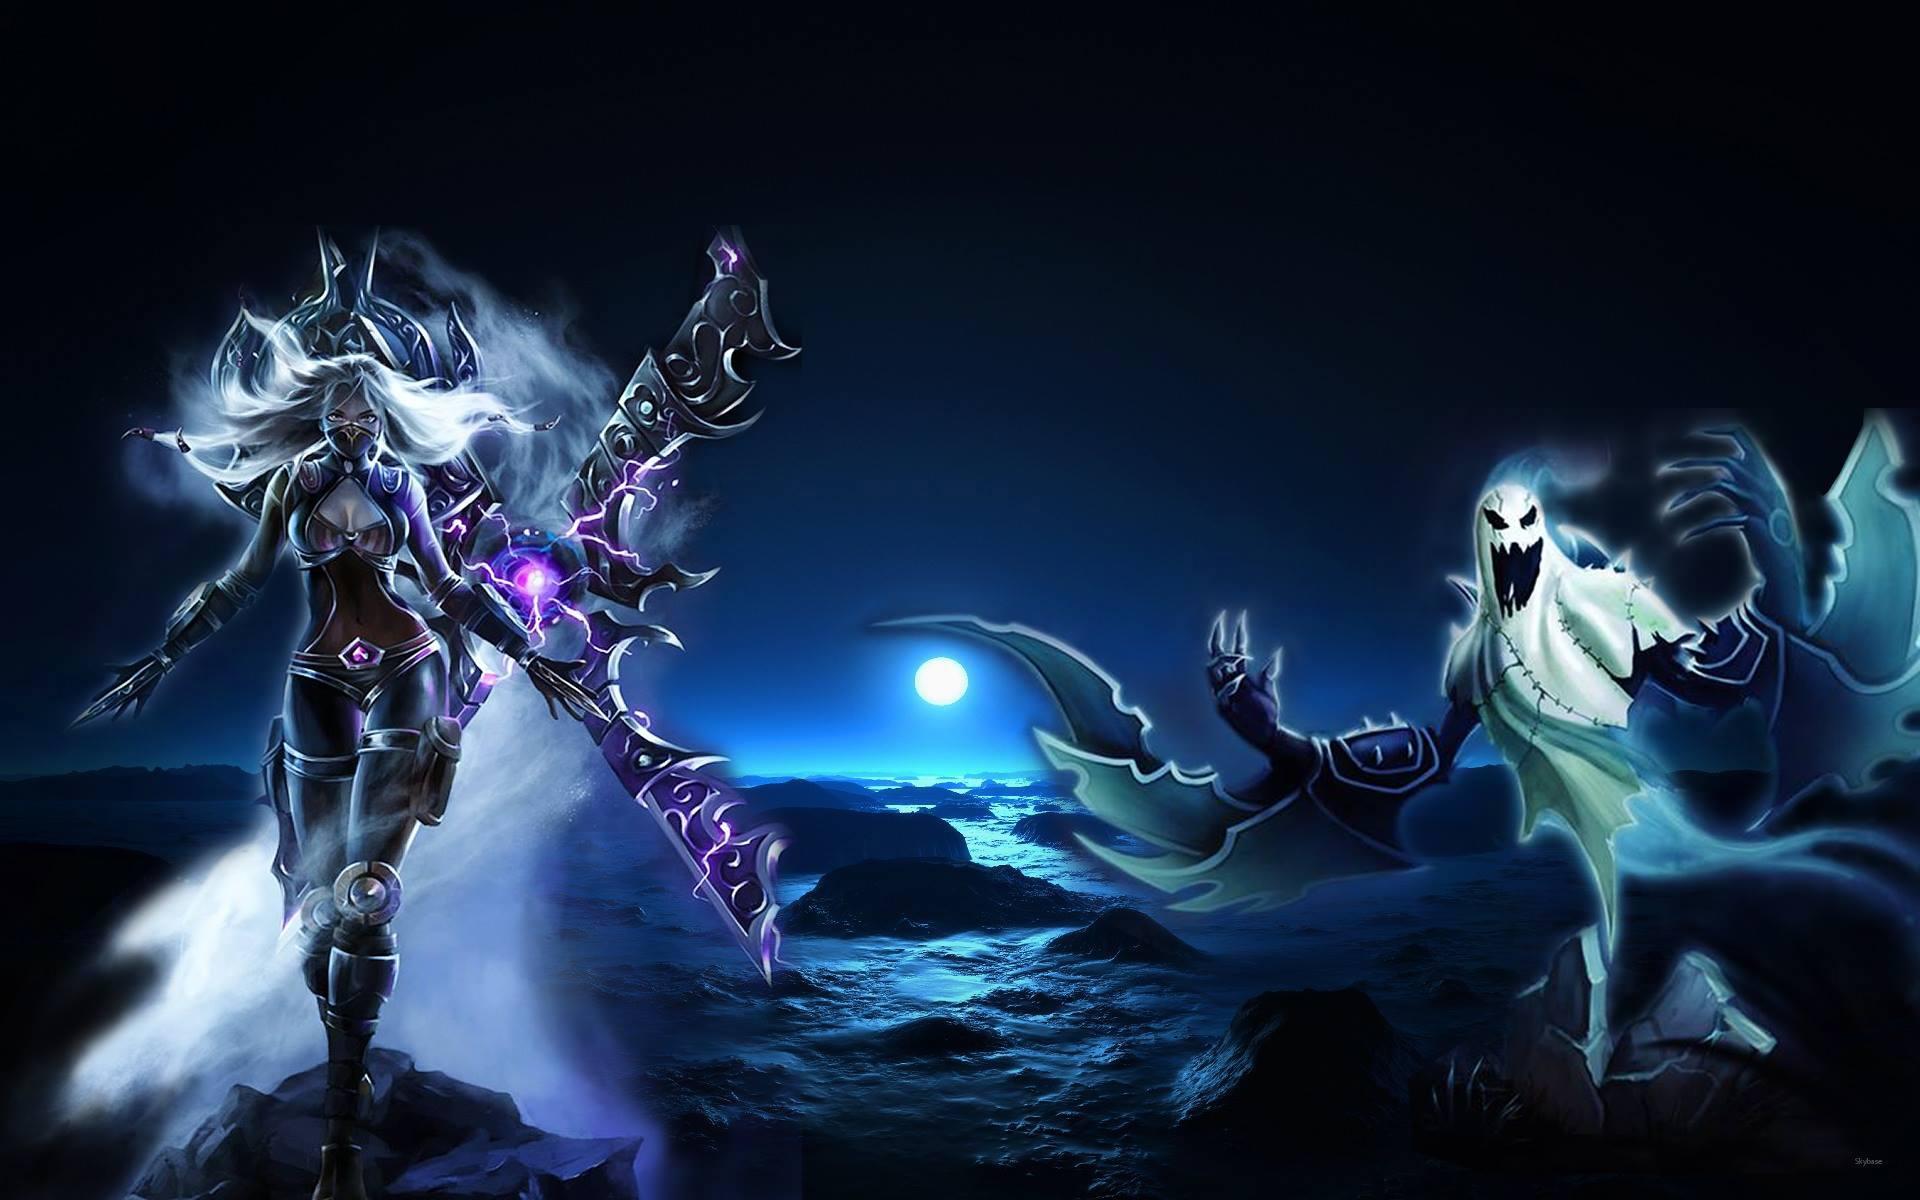 Nightblade Irelia X Haunting Nocturne Wallpaper by ...